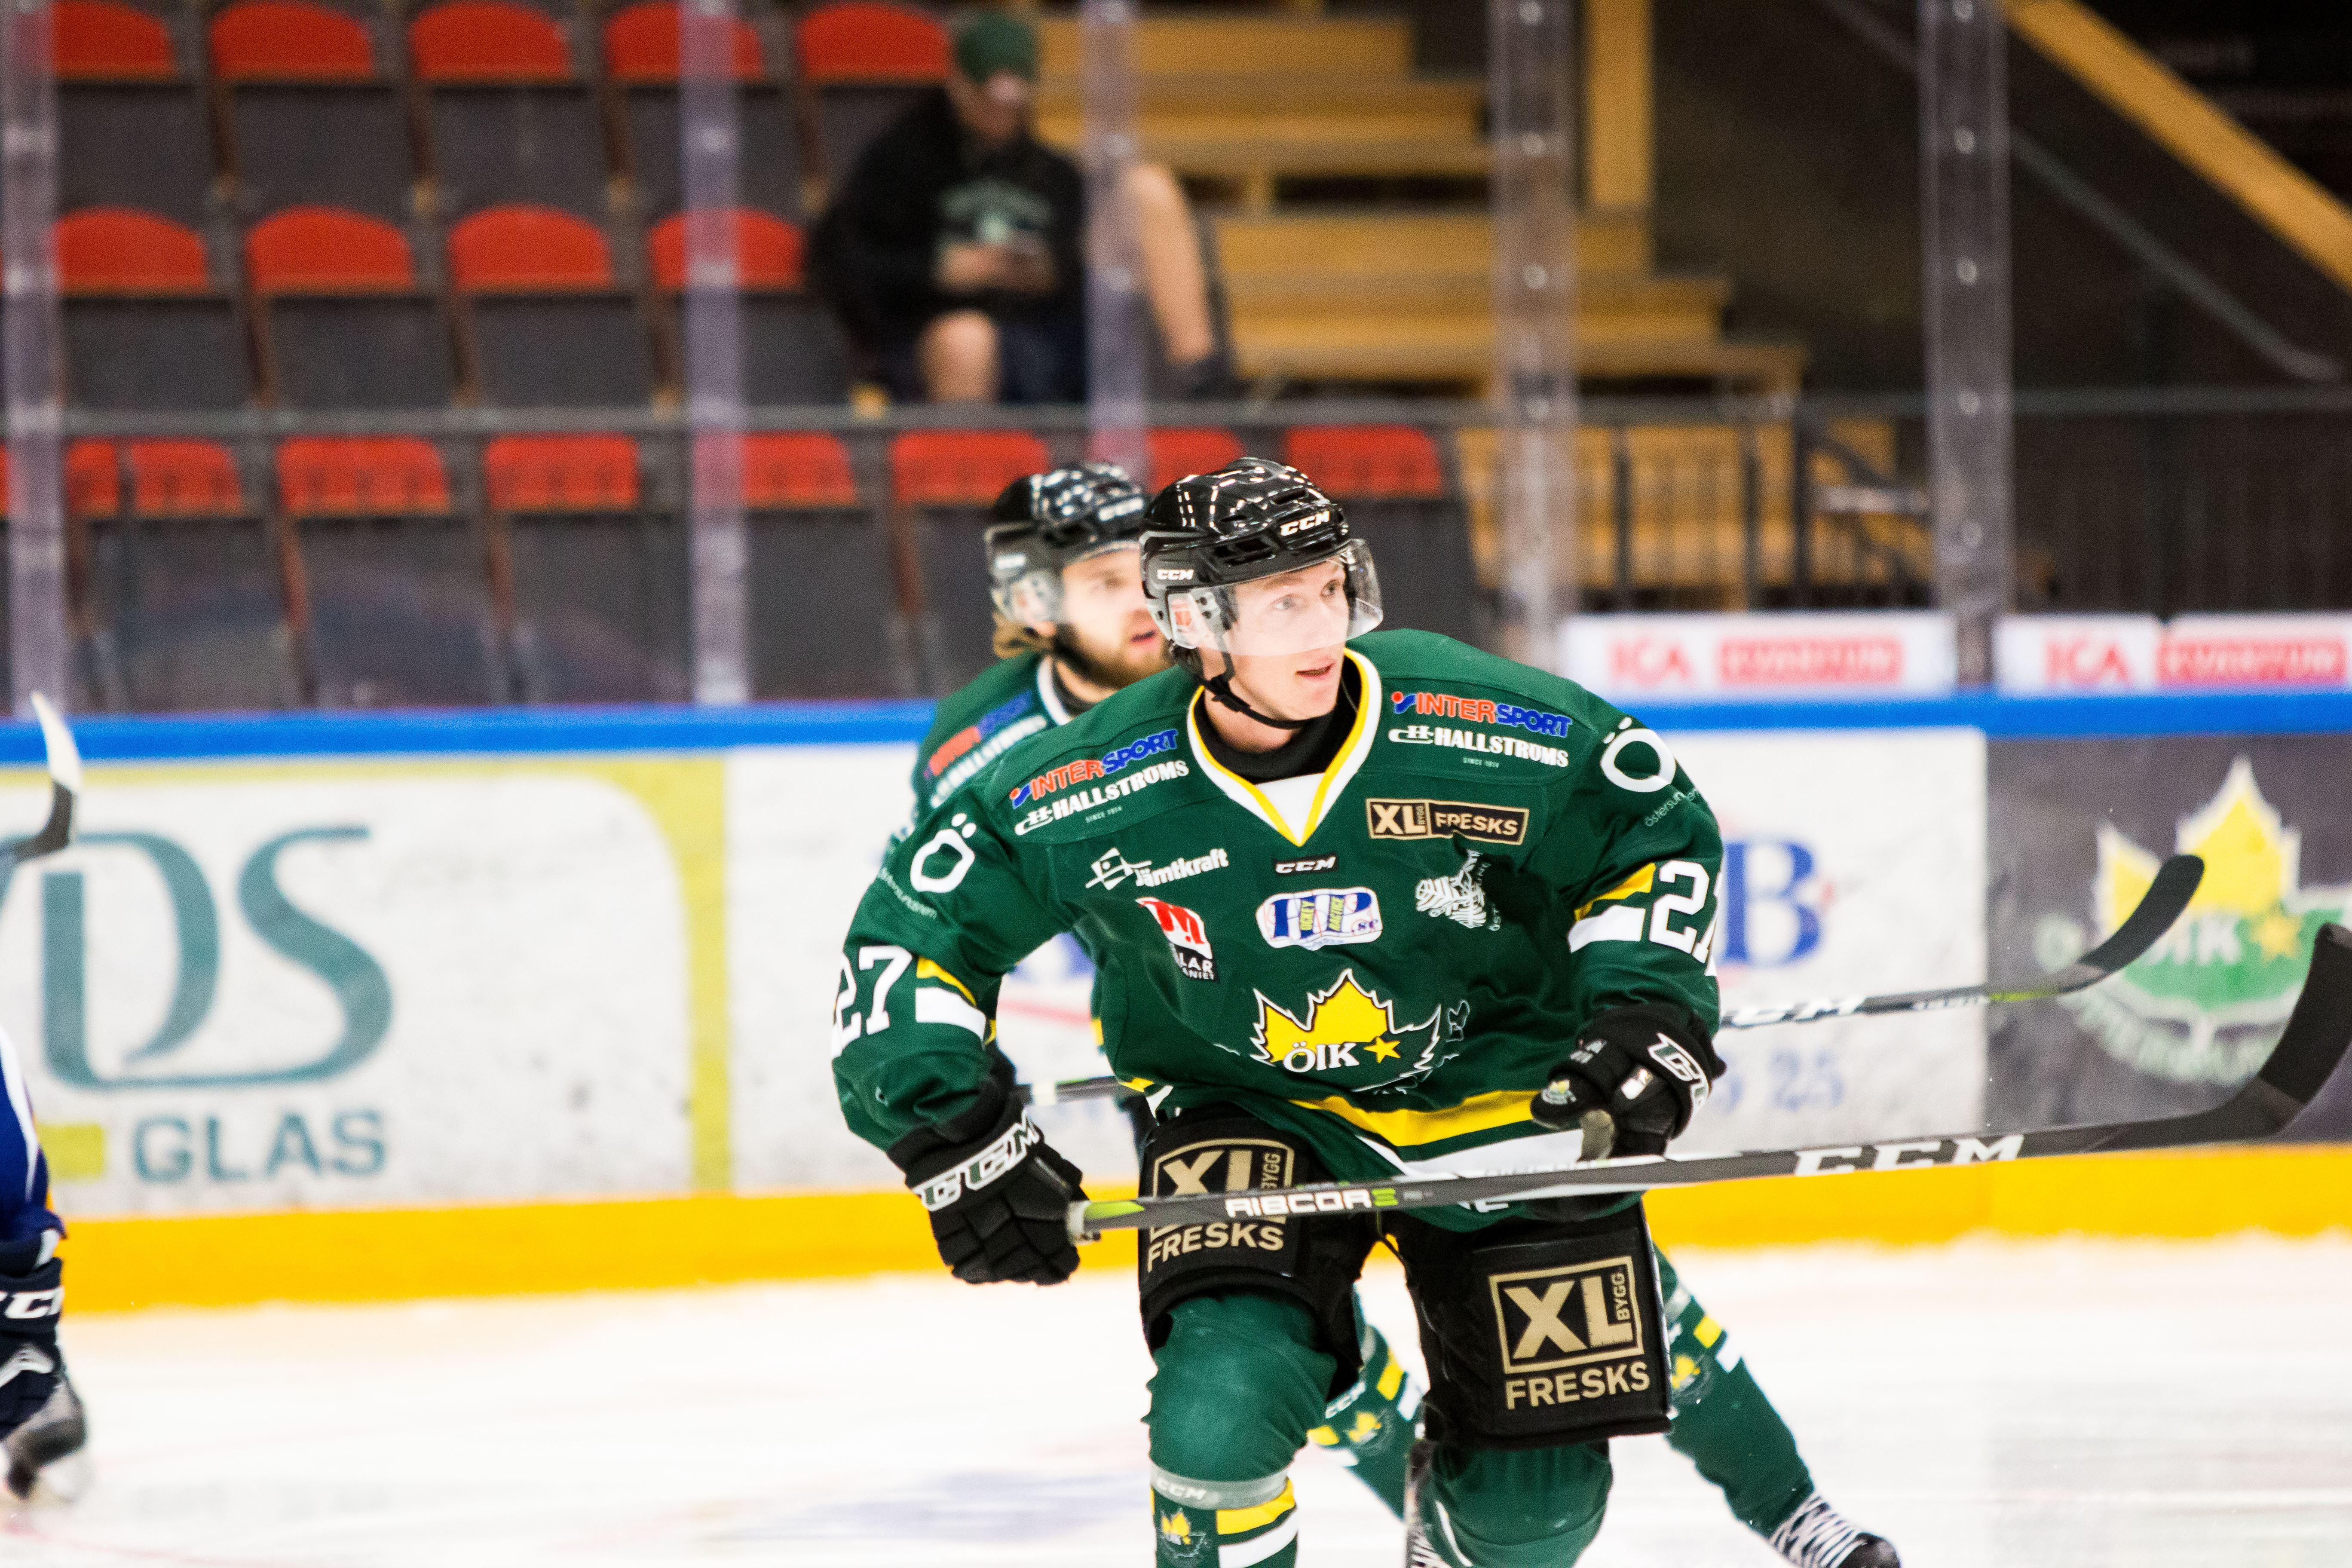 Hockey: ÖIK vs SK Lejon